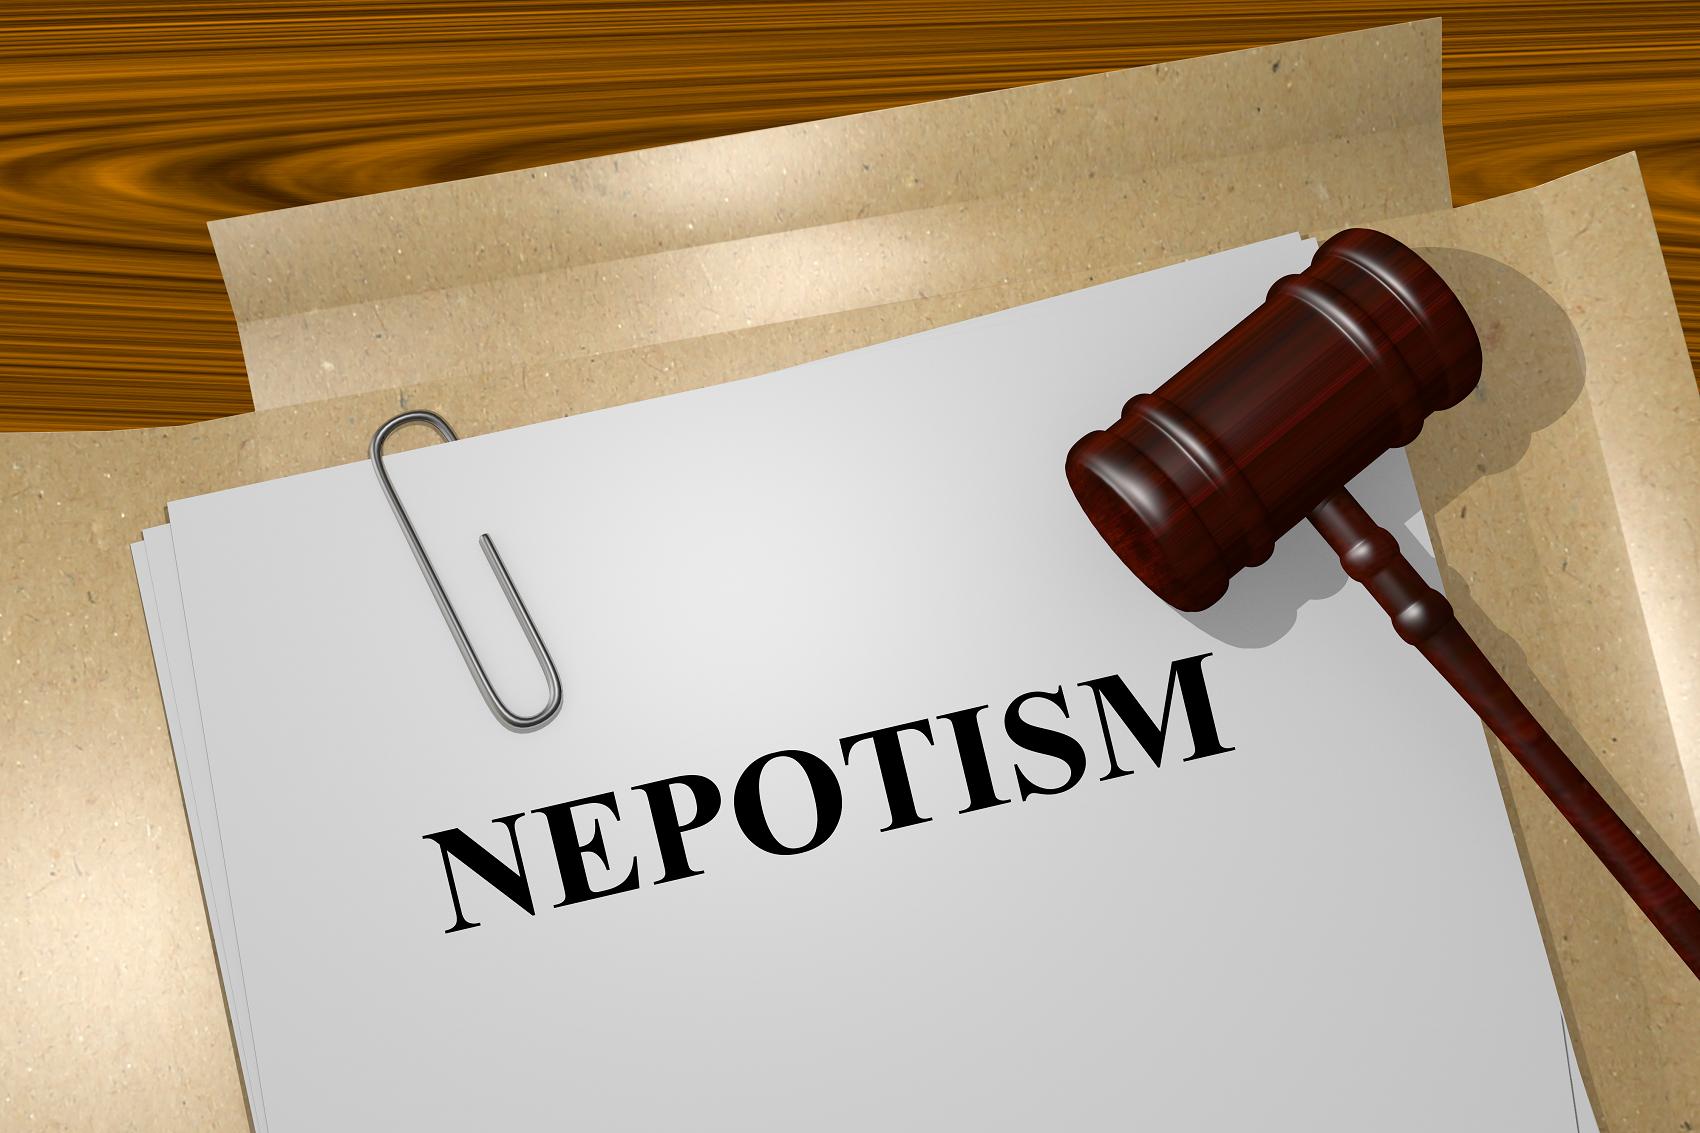 nepotism in Kenya - Do you know somebody